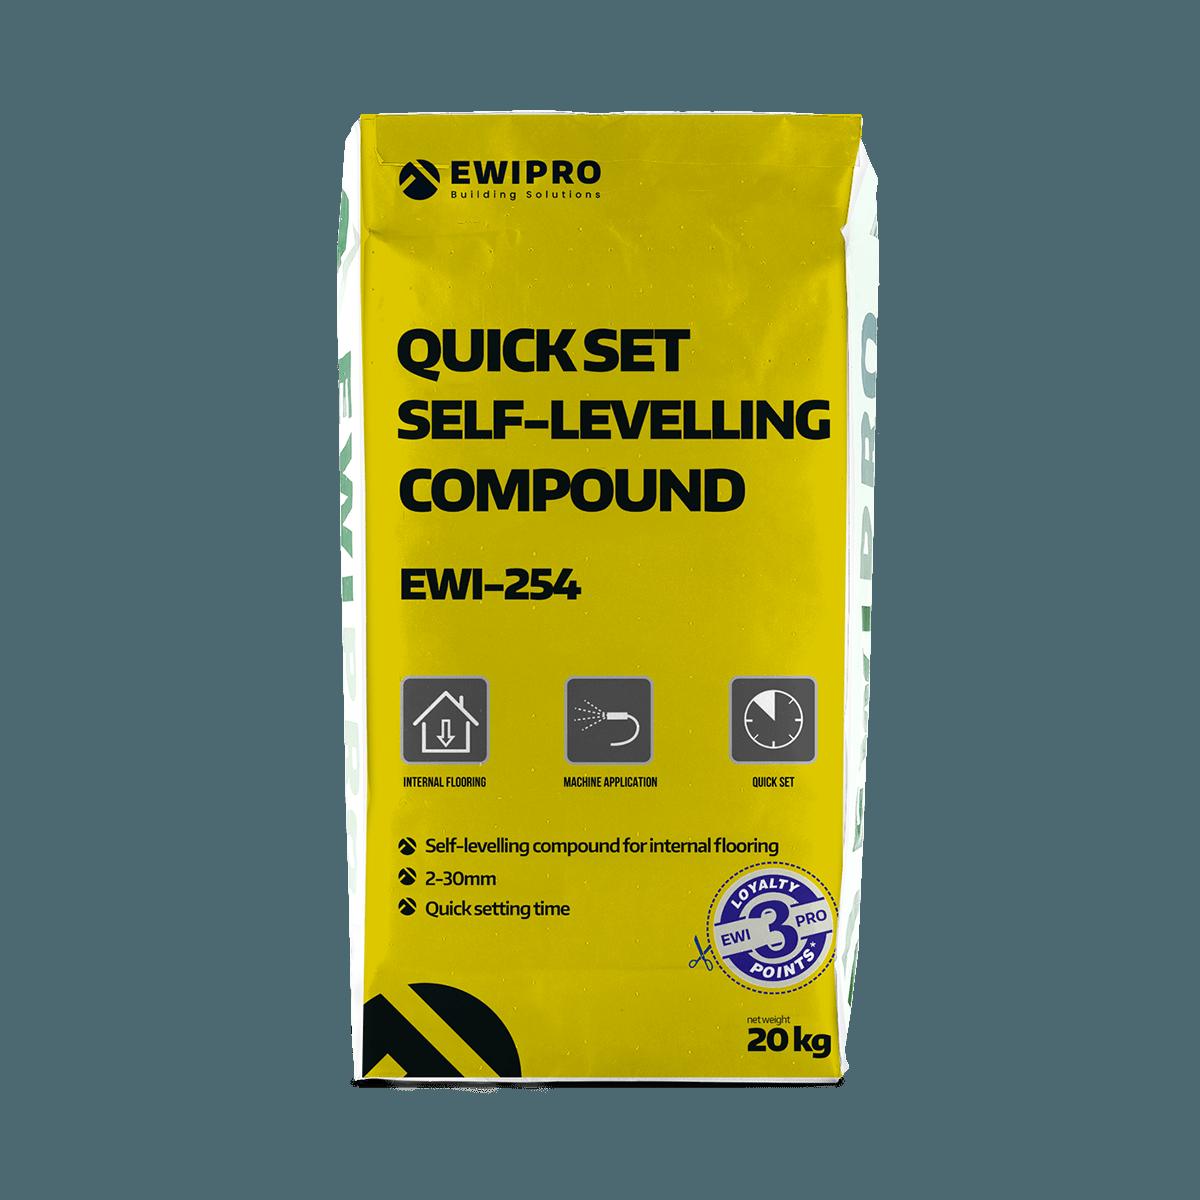 Quick Set Self-Levelling Compound EWI-254 - EWI Pro Systems